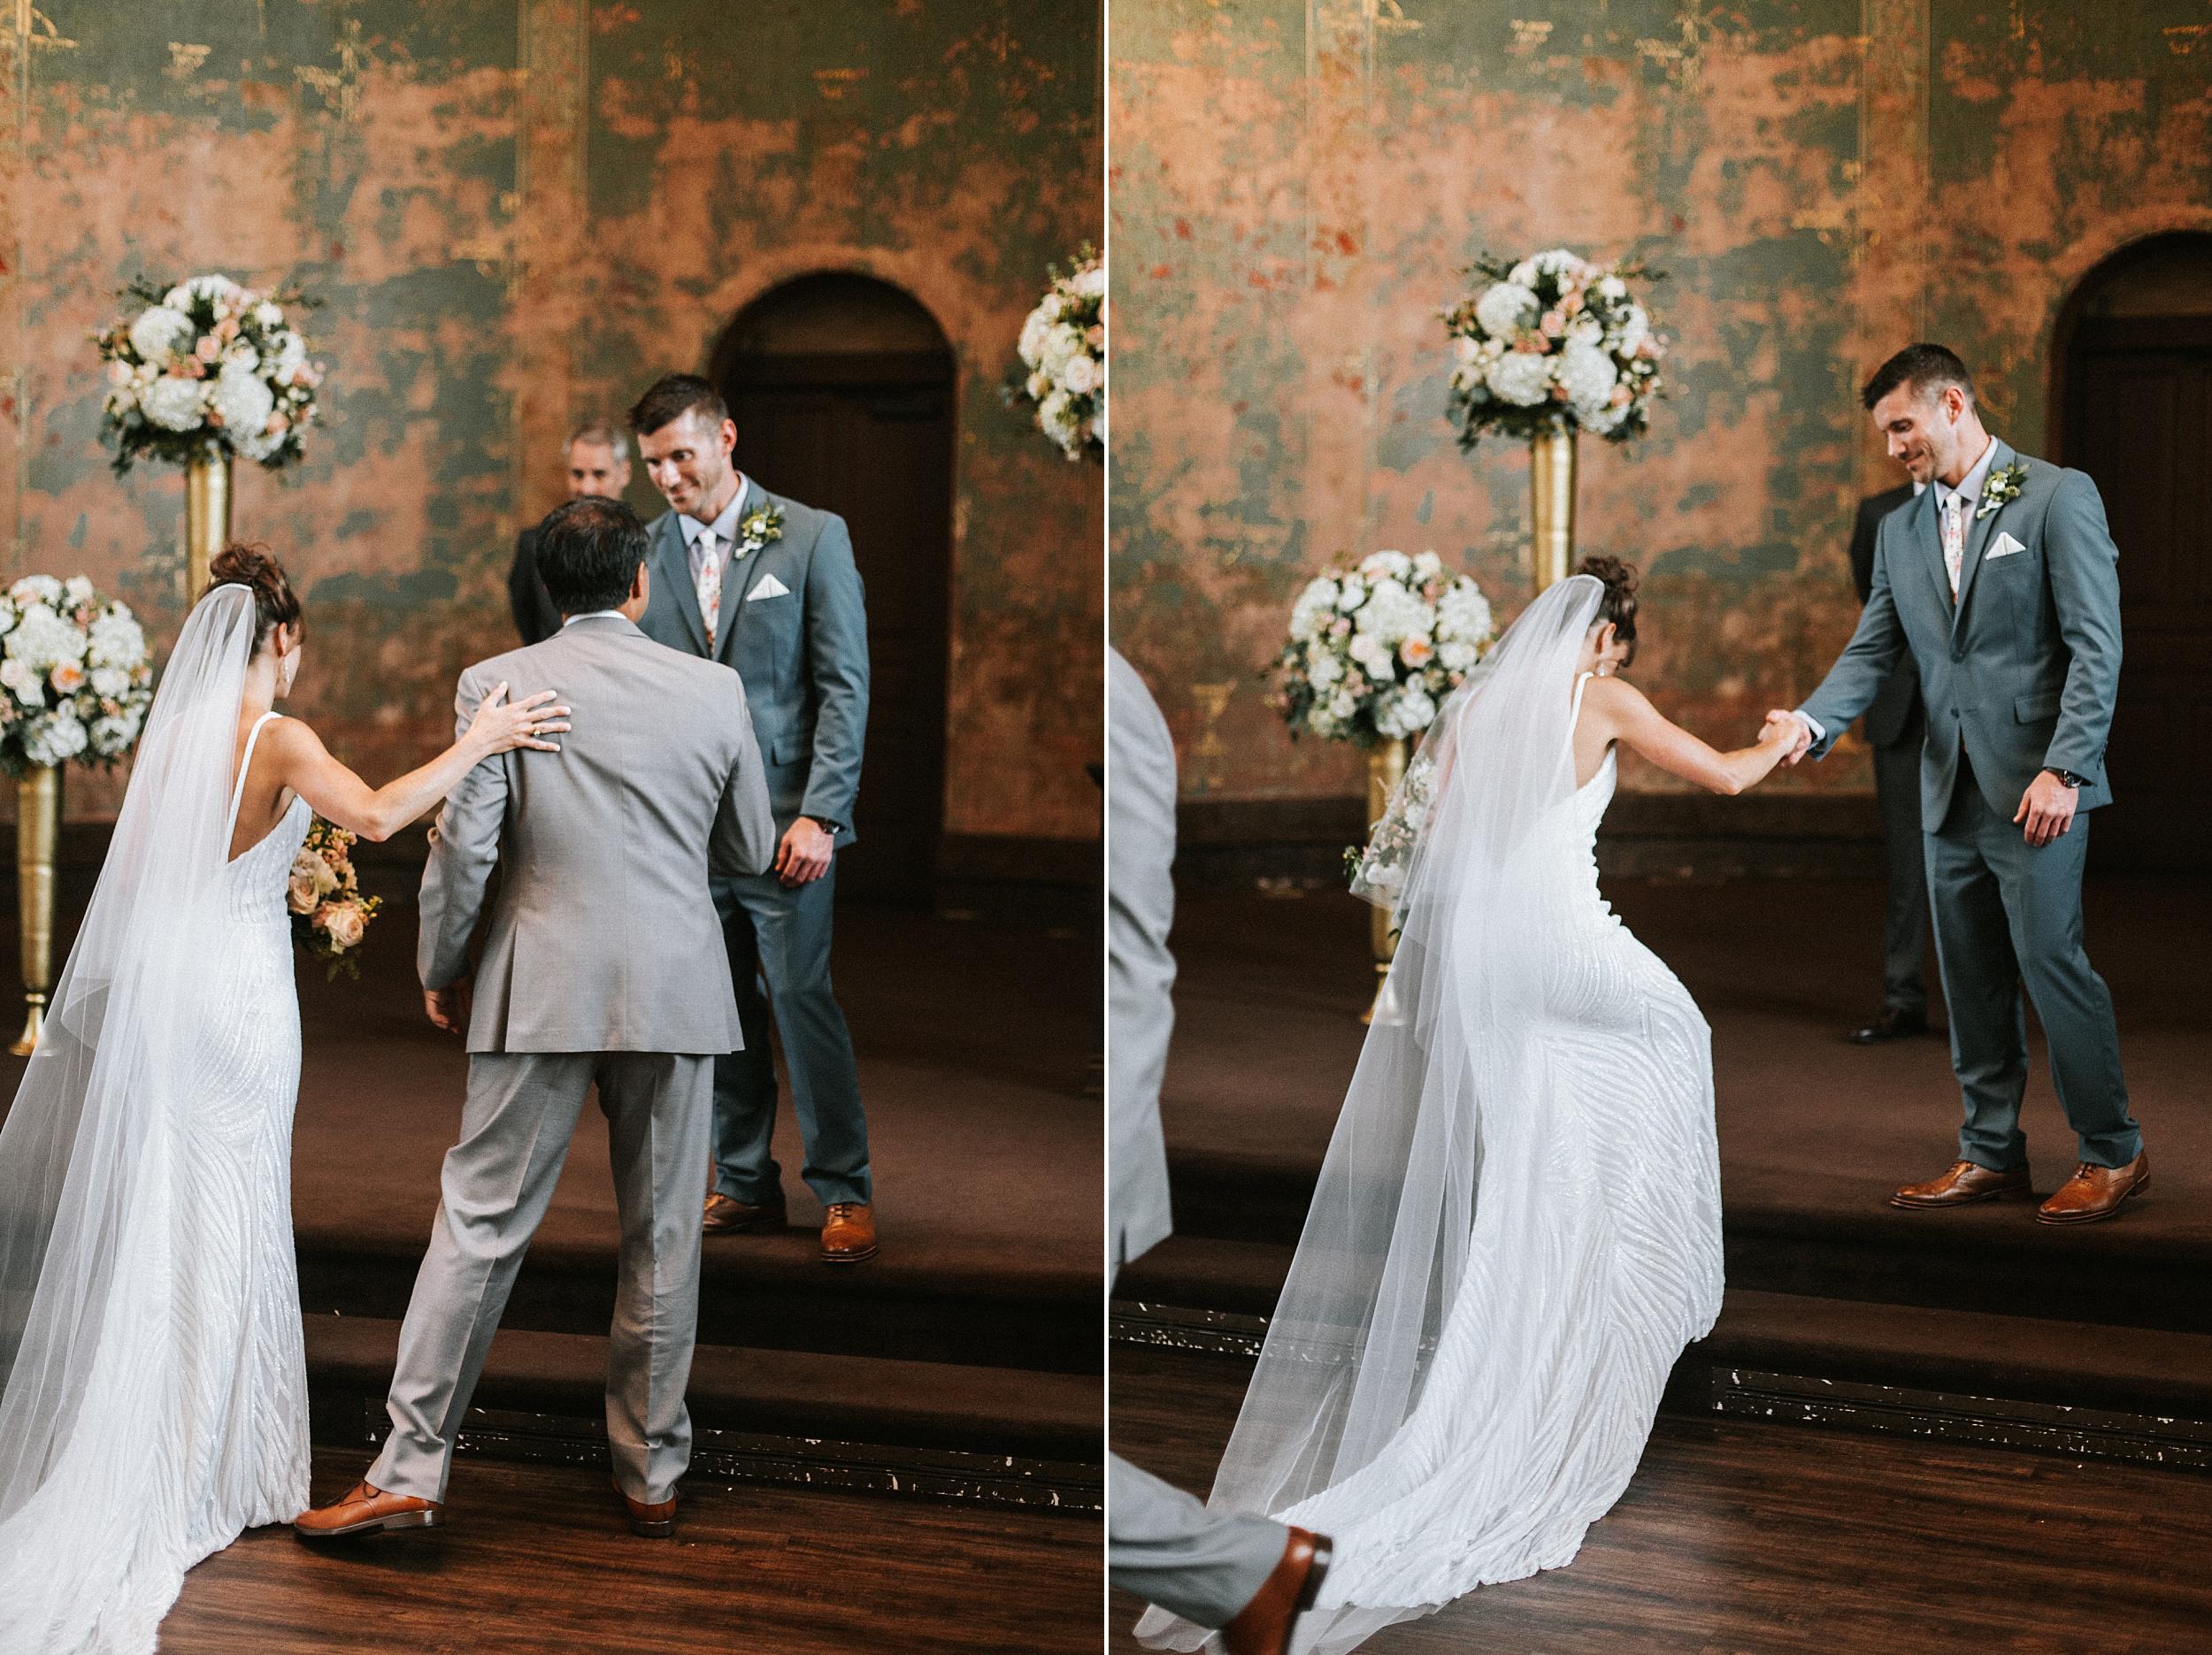 Brooke Townsend Photography - Cincinnati Wedding Photographer (112 of 170).jpg